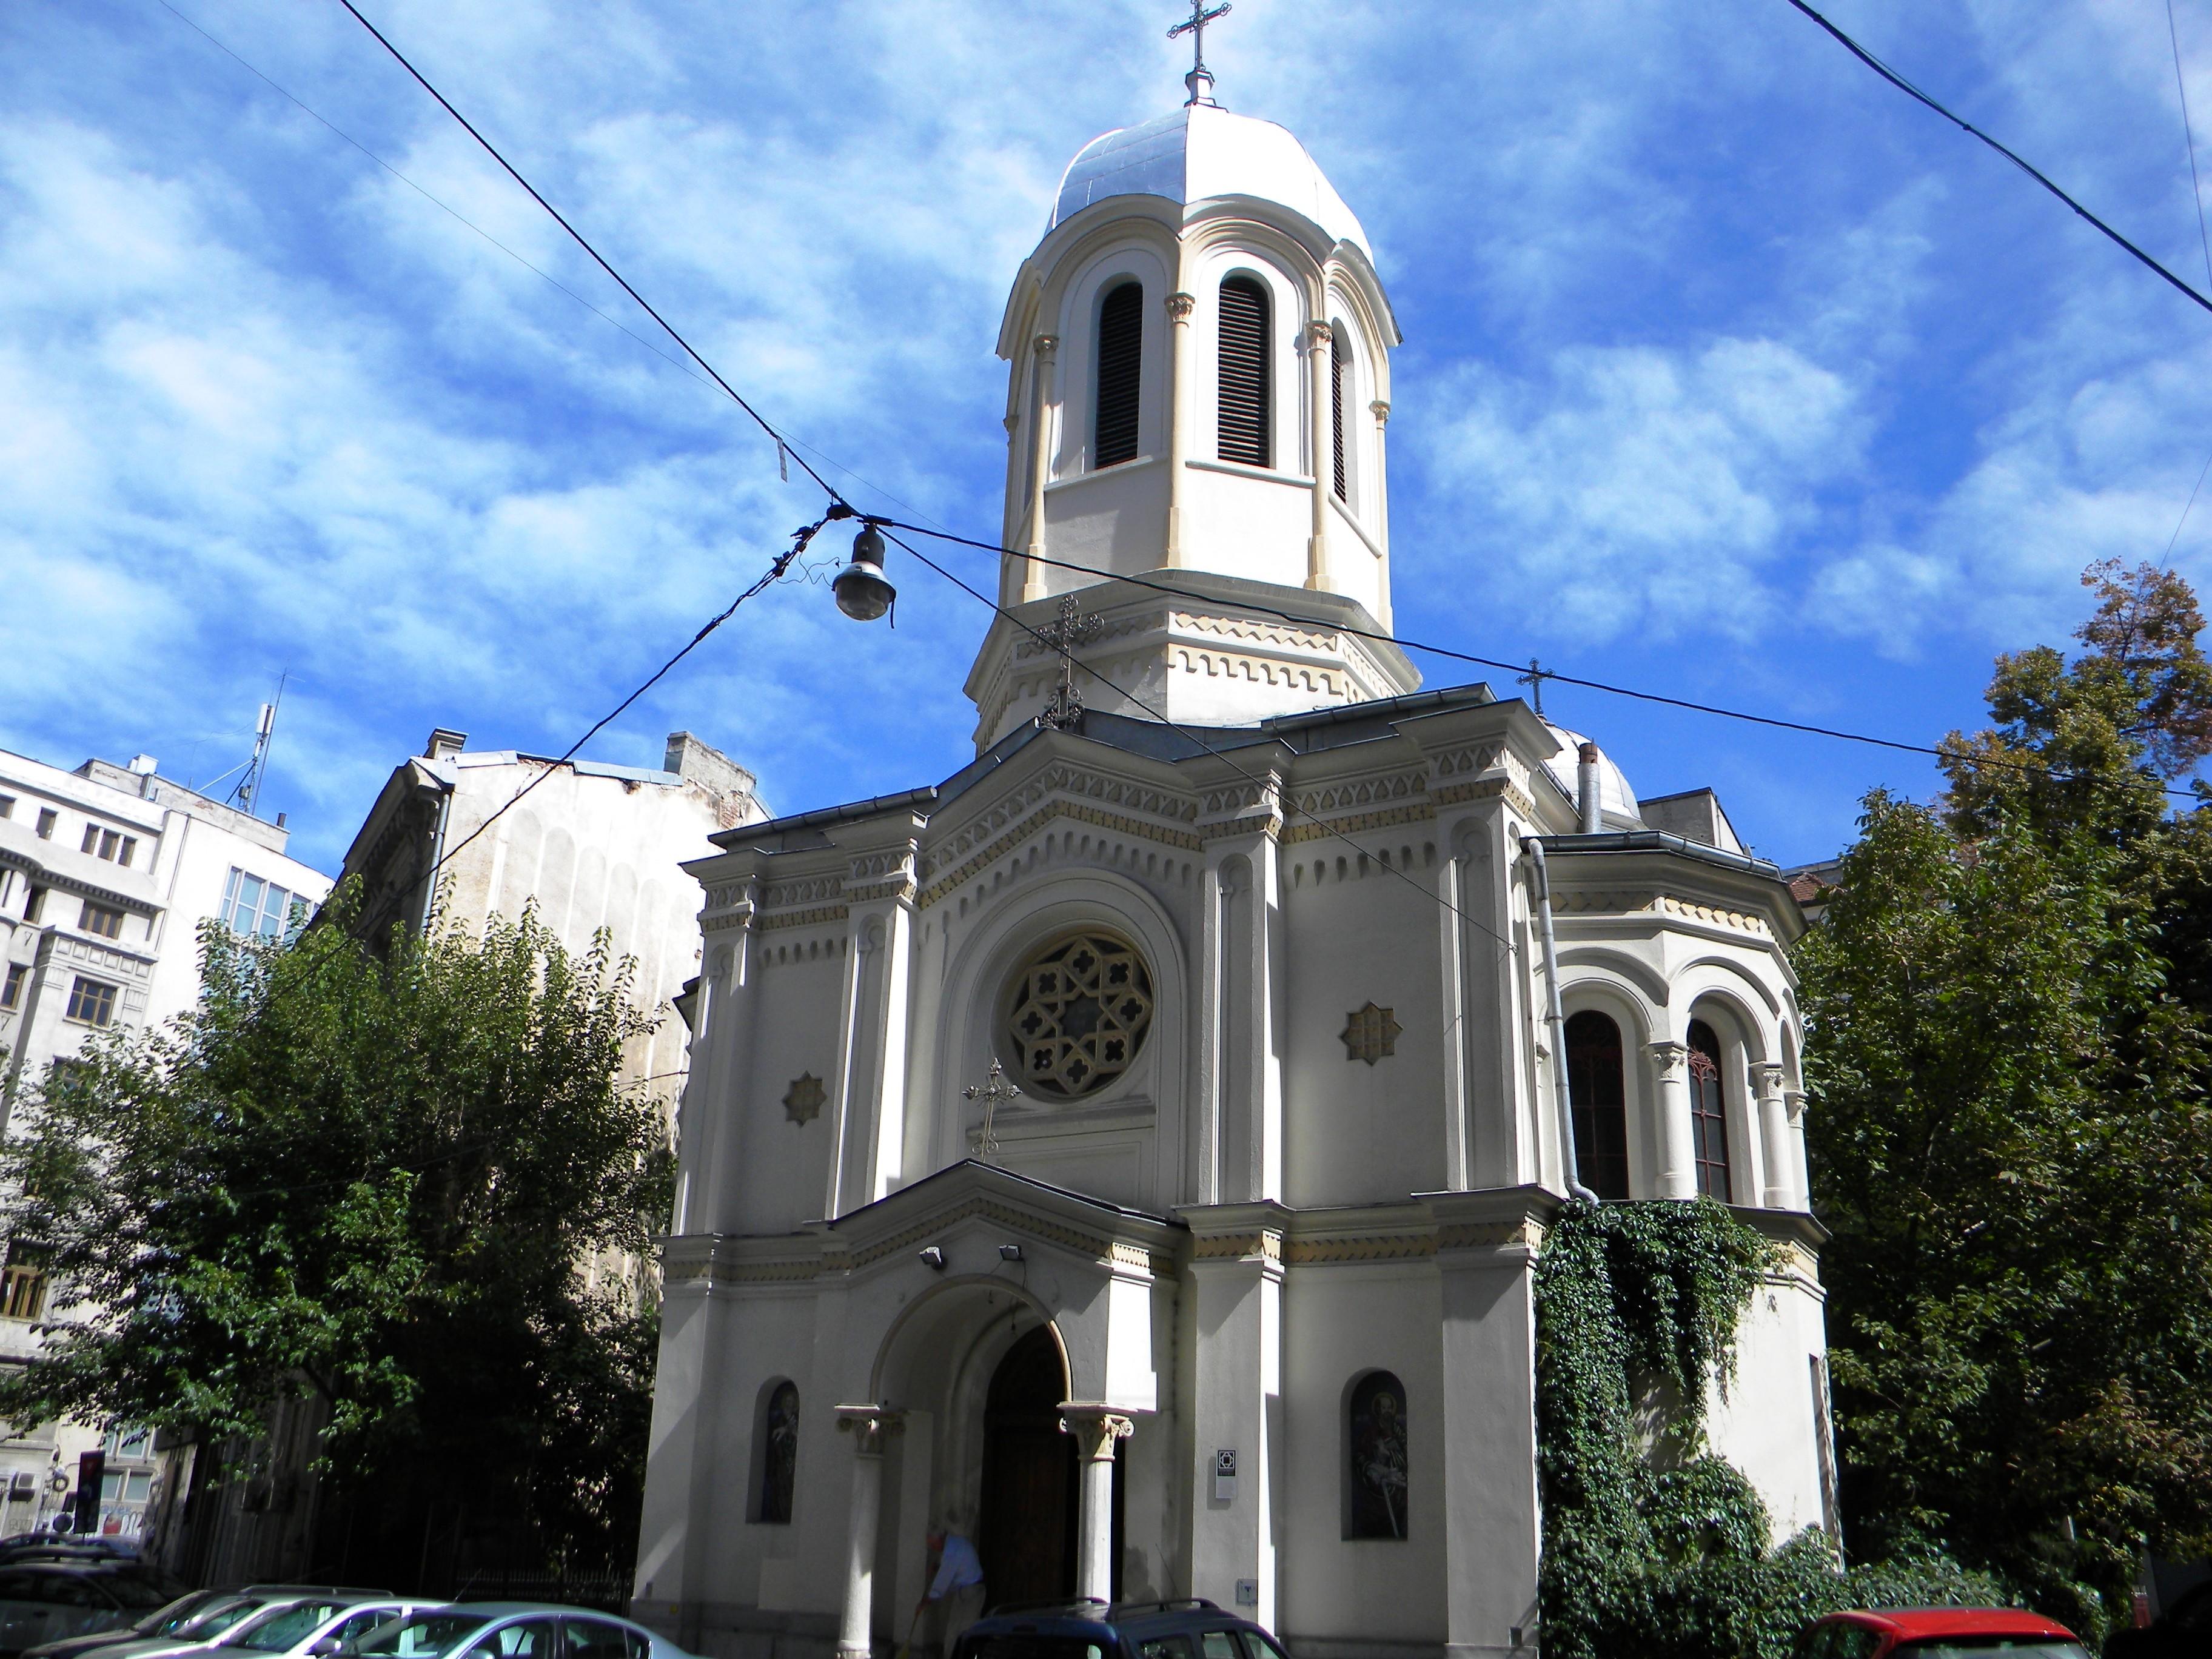 La Biserica Sf. Nicolae Selari vin sa se roage multi elevi si studenti care au de dat examene